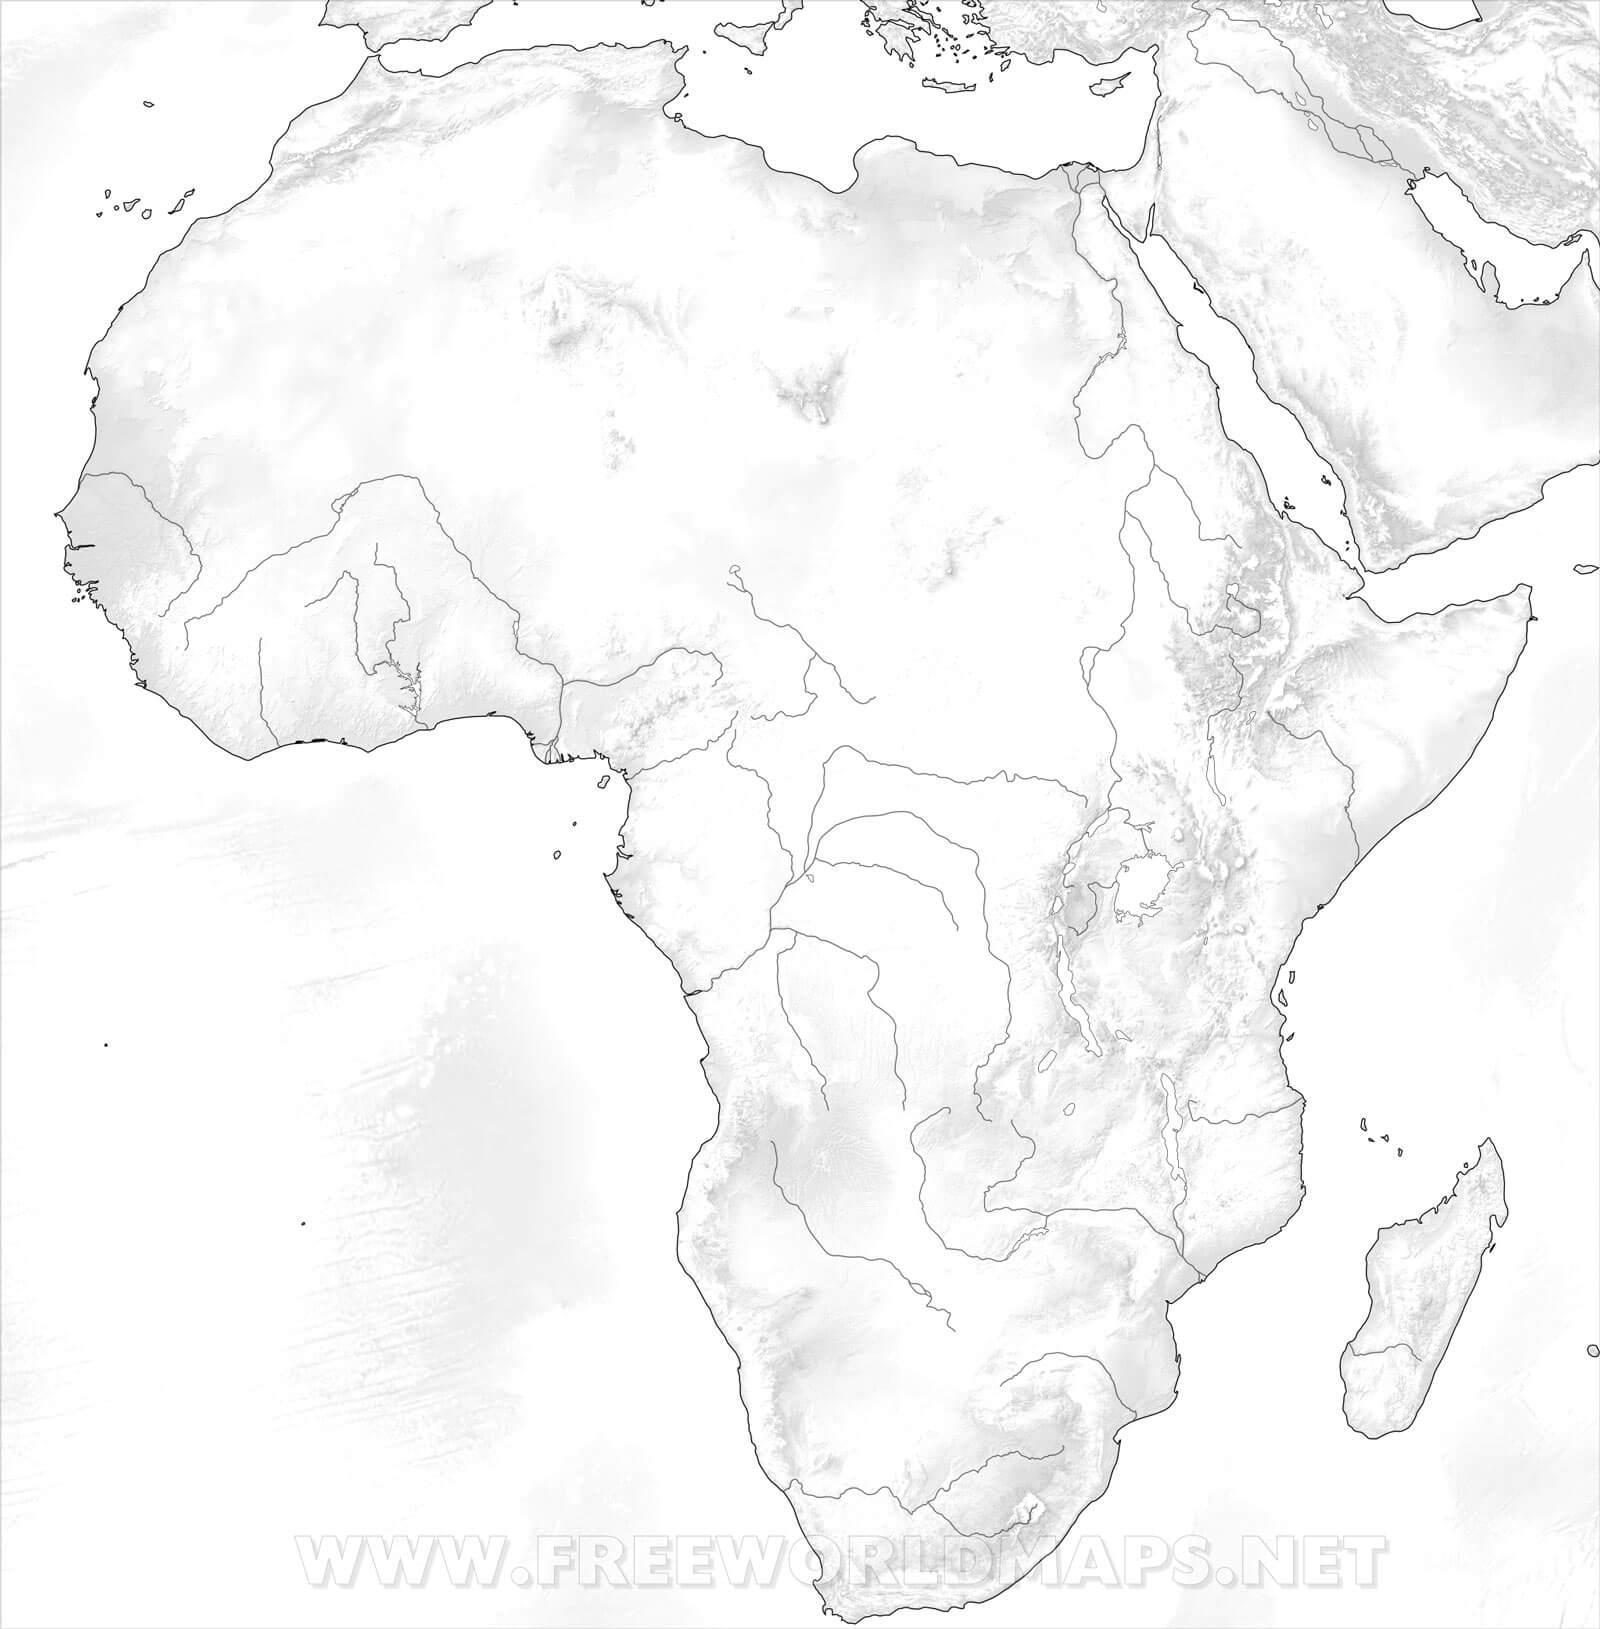 Stumme Karte Afrika.Karte Von Afrika Freeworldmaps Net